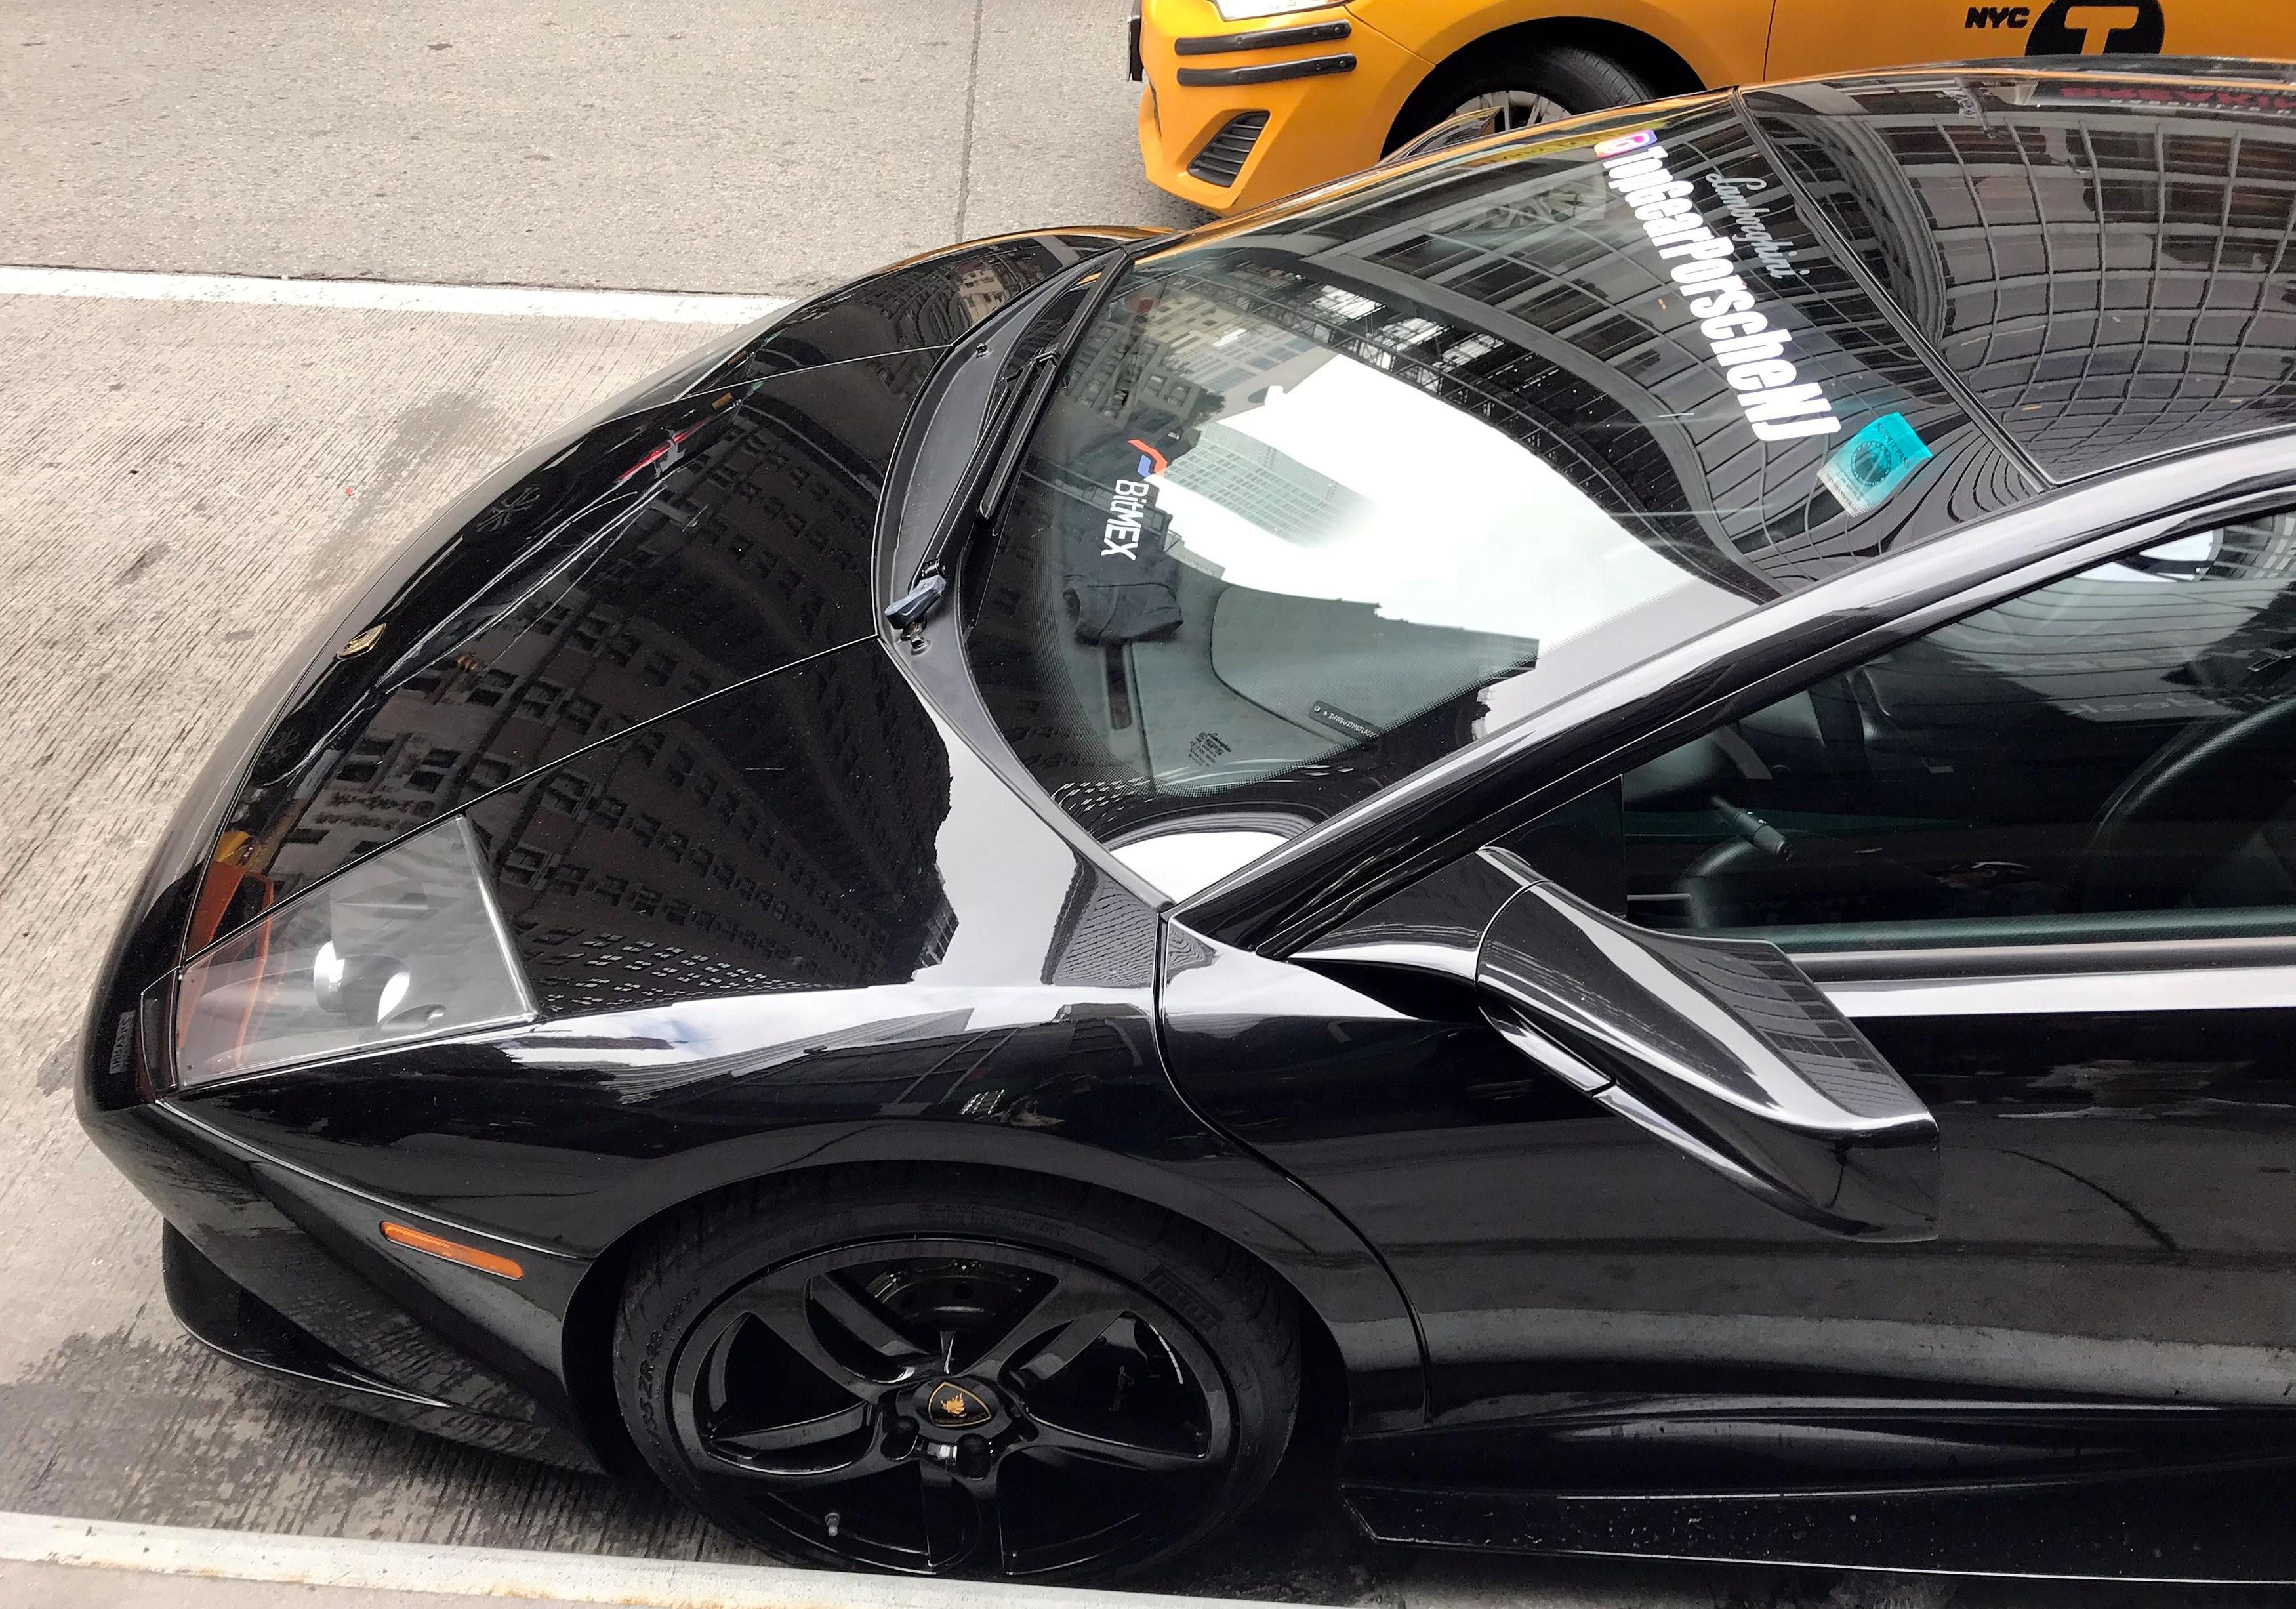 Lamborghinis greet crypto fans at Blockchain Week in New